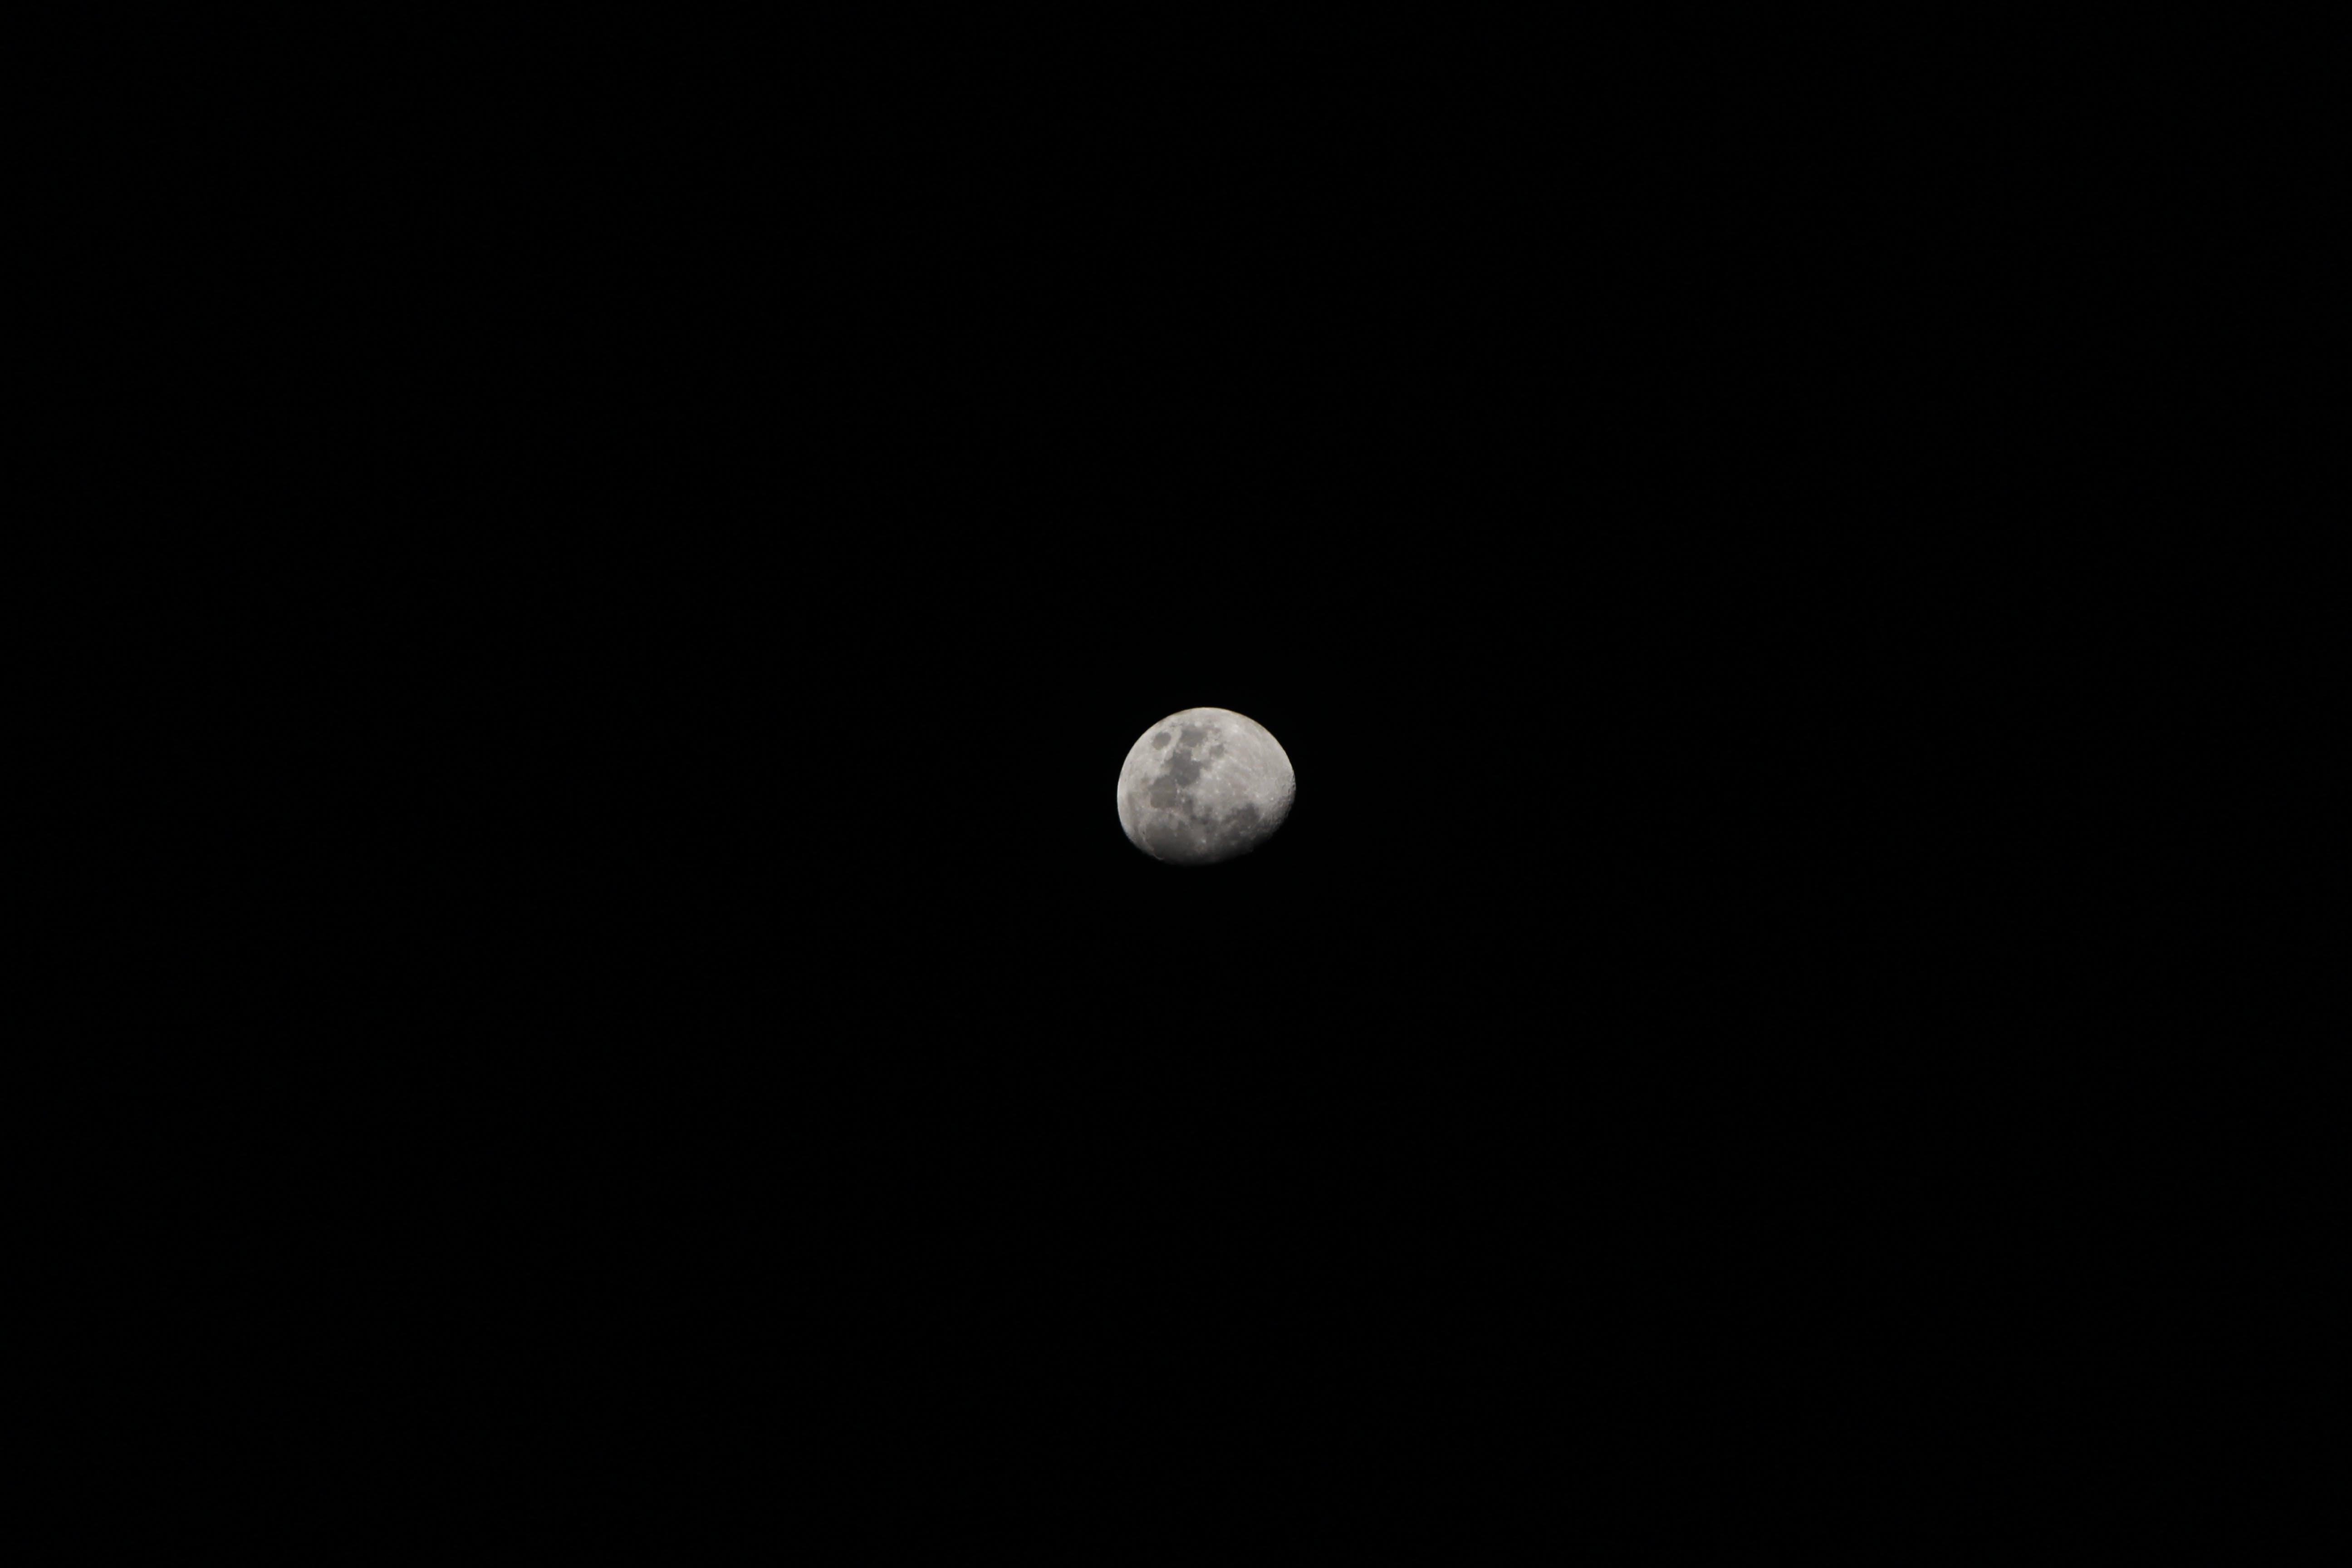 astronomy, black, black and white